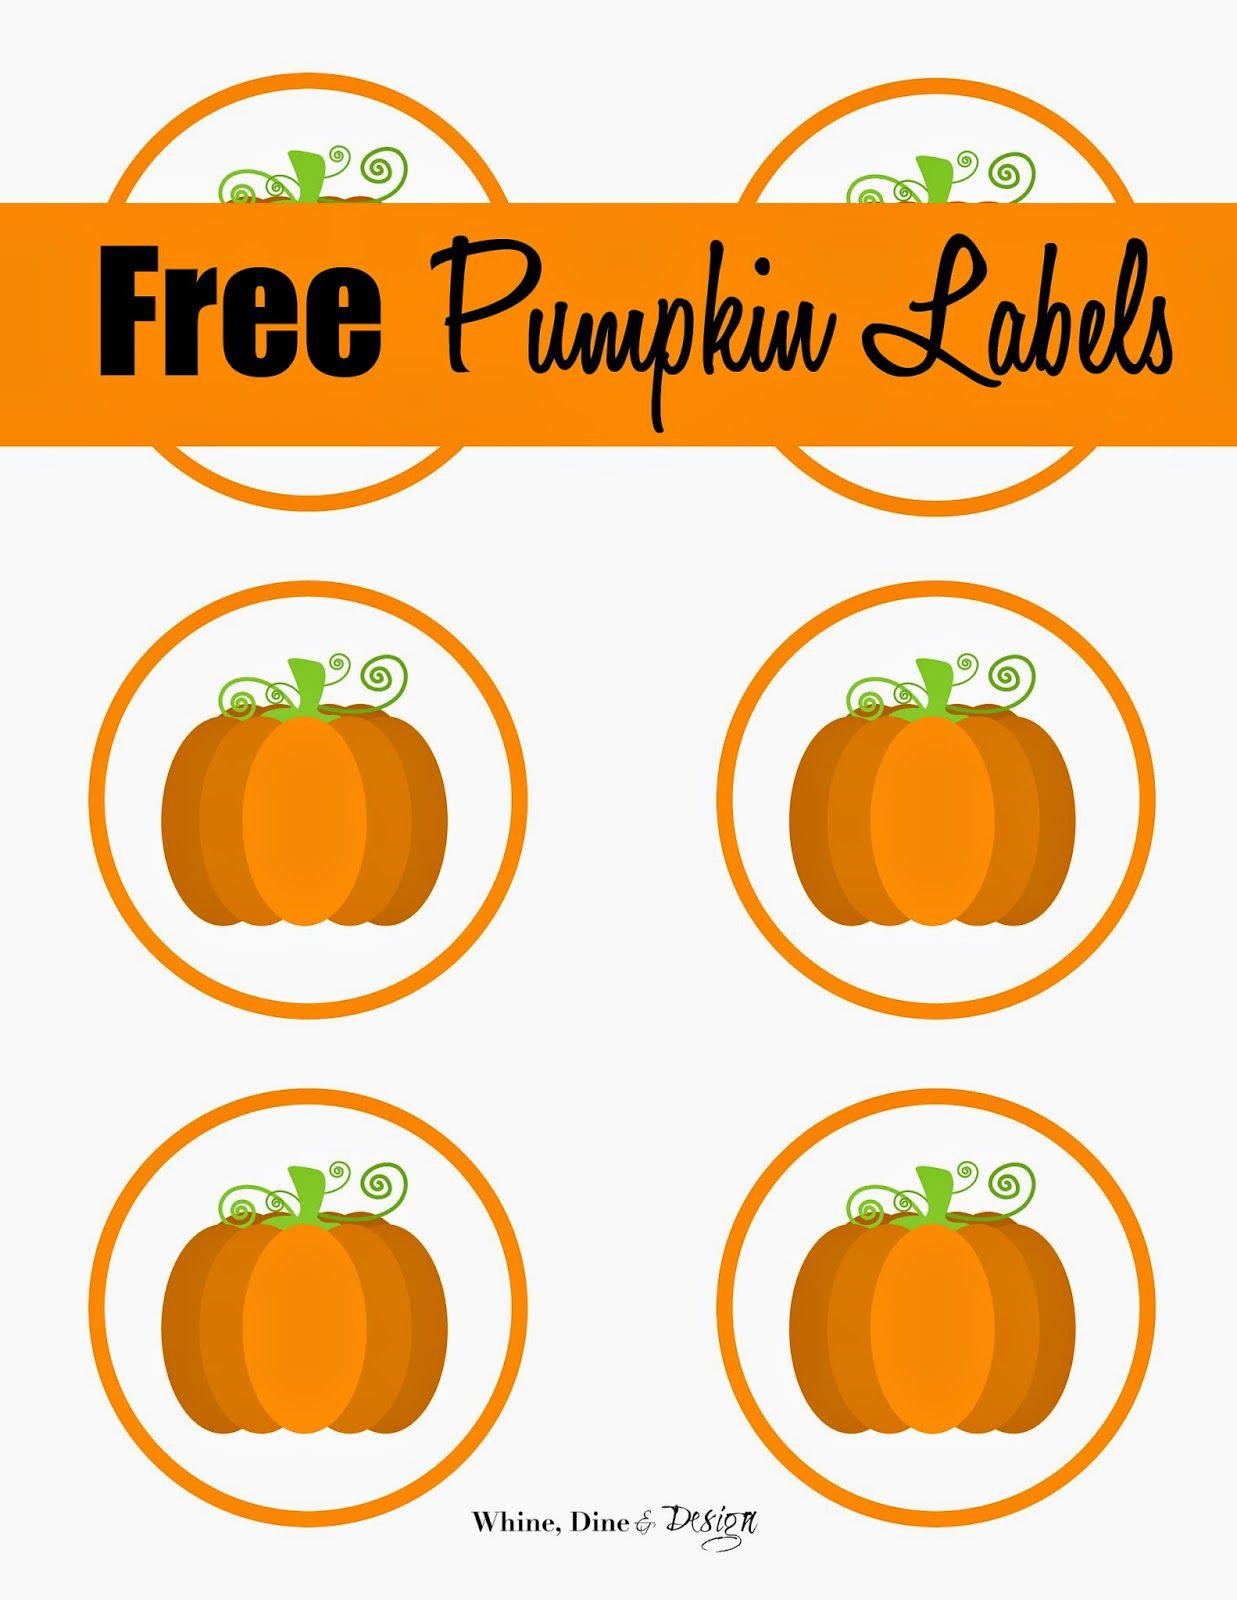 Free Printable Pumpkin Labels/cupcake Toppers   Craft Ideas/diy - Free Printable Pumpkin Gift Tags